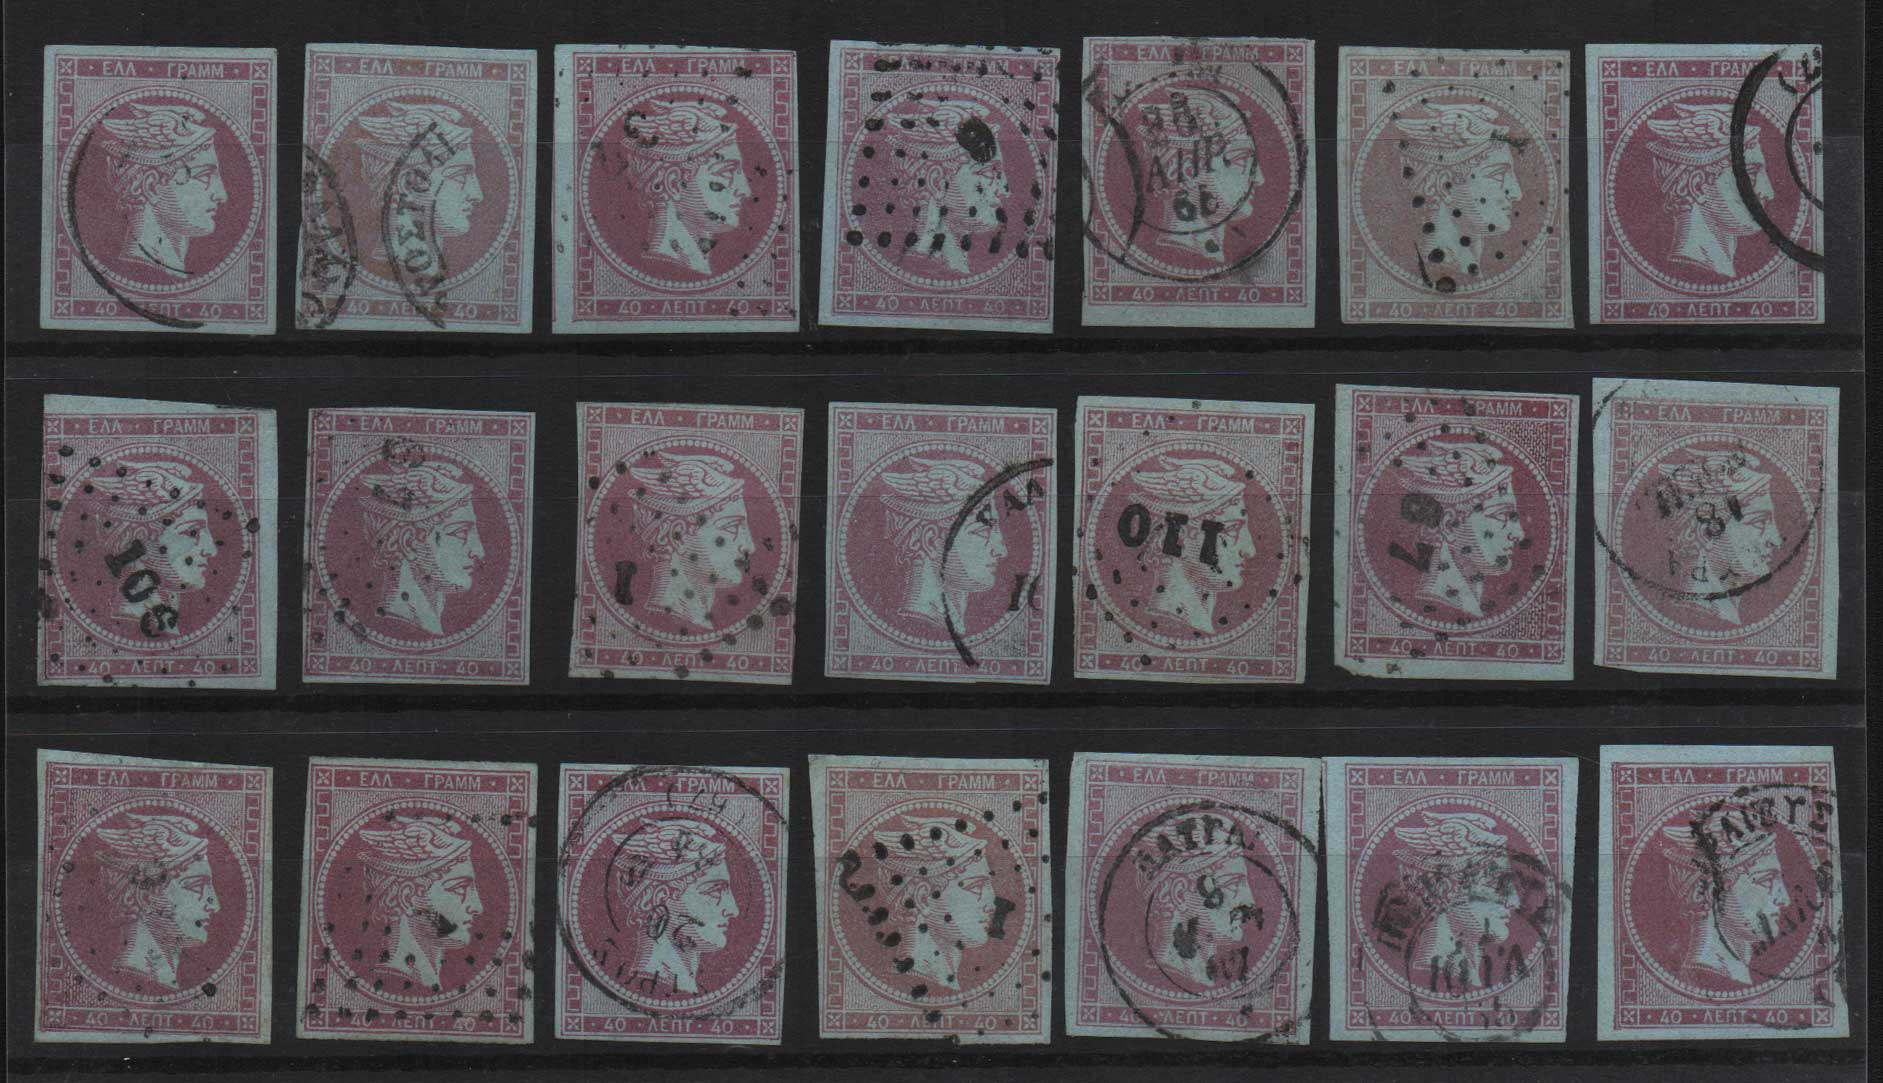 Lot 9 - -  LARGE HERMES HEAD large hermes head -  Athens Auctions Public Auction 70 General Stamp Sale